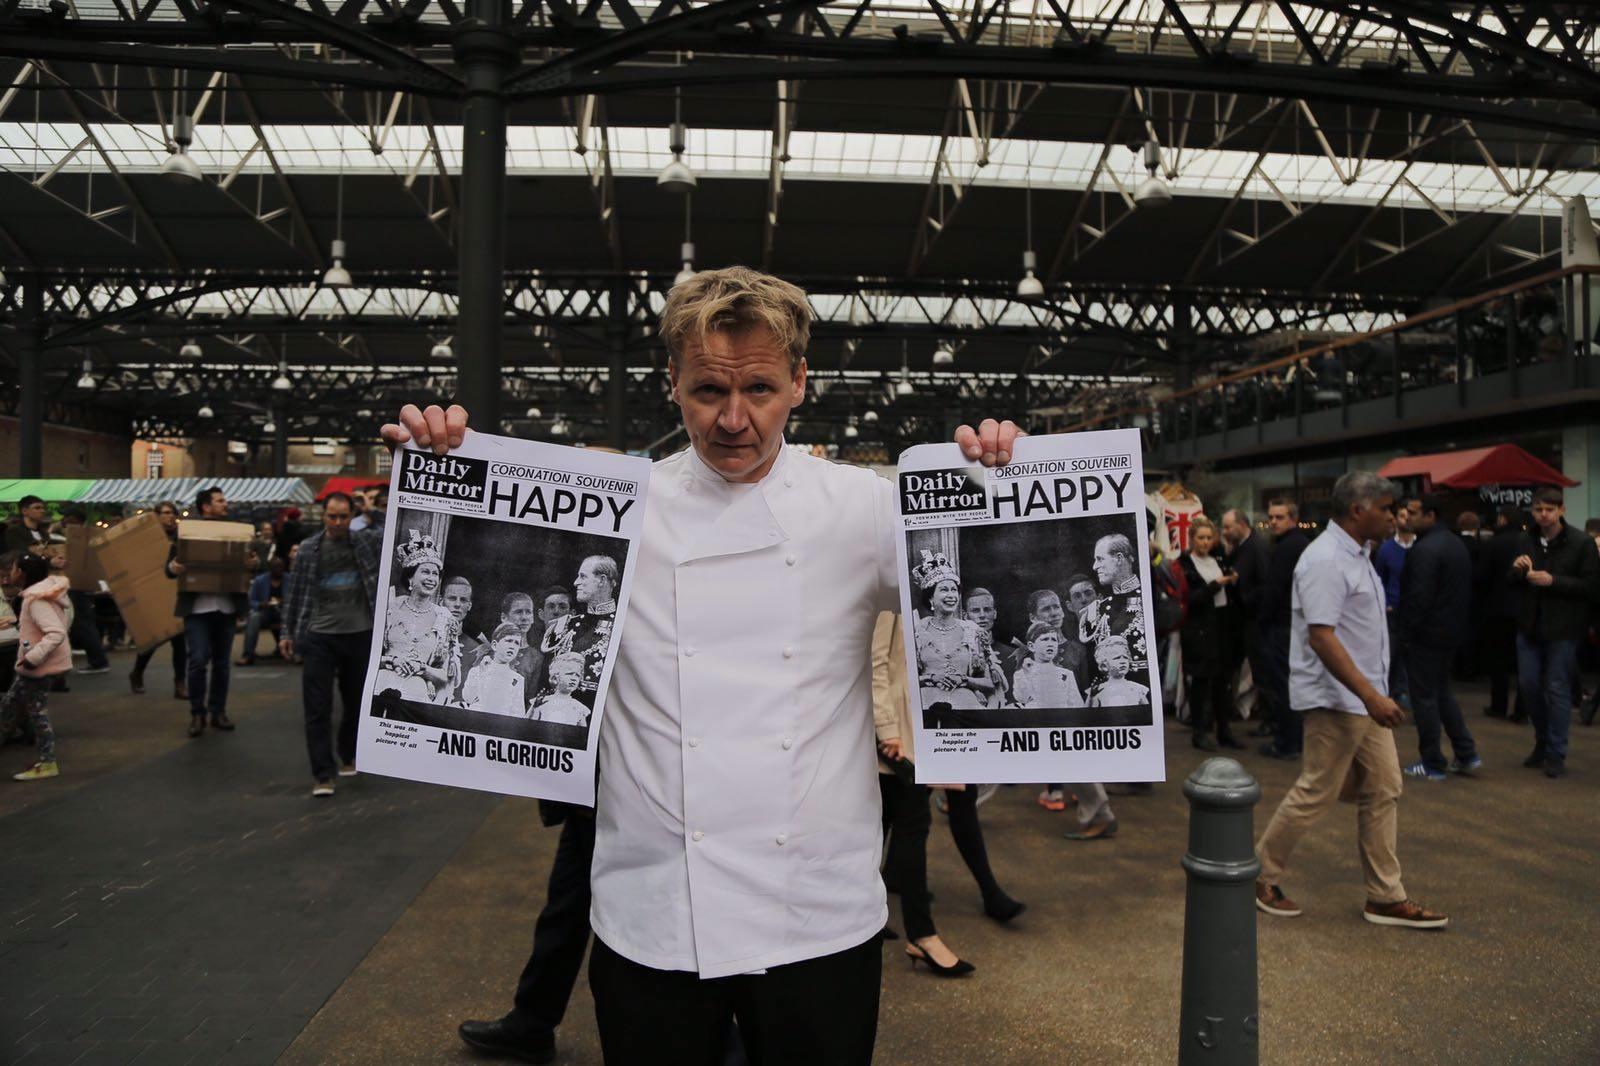 Gordon Ramsay lookalike with Historic Newspapers